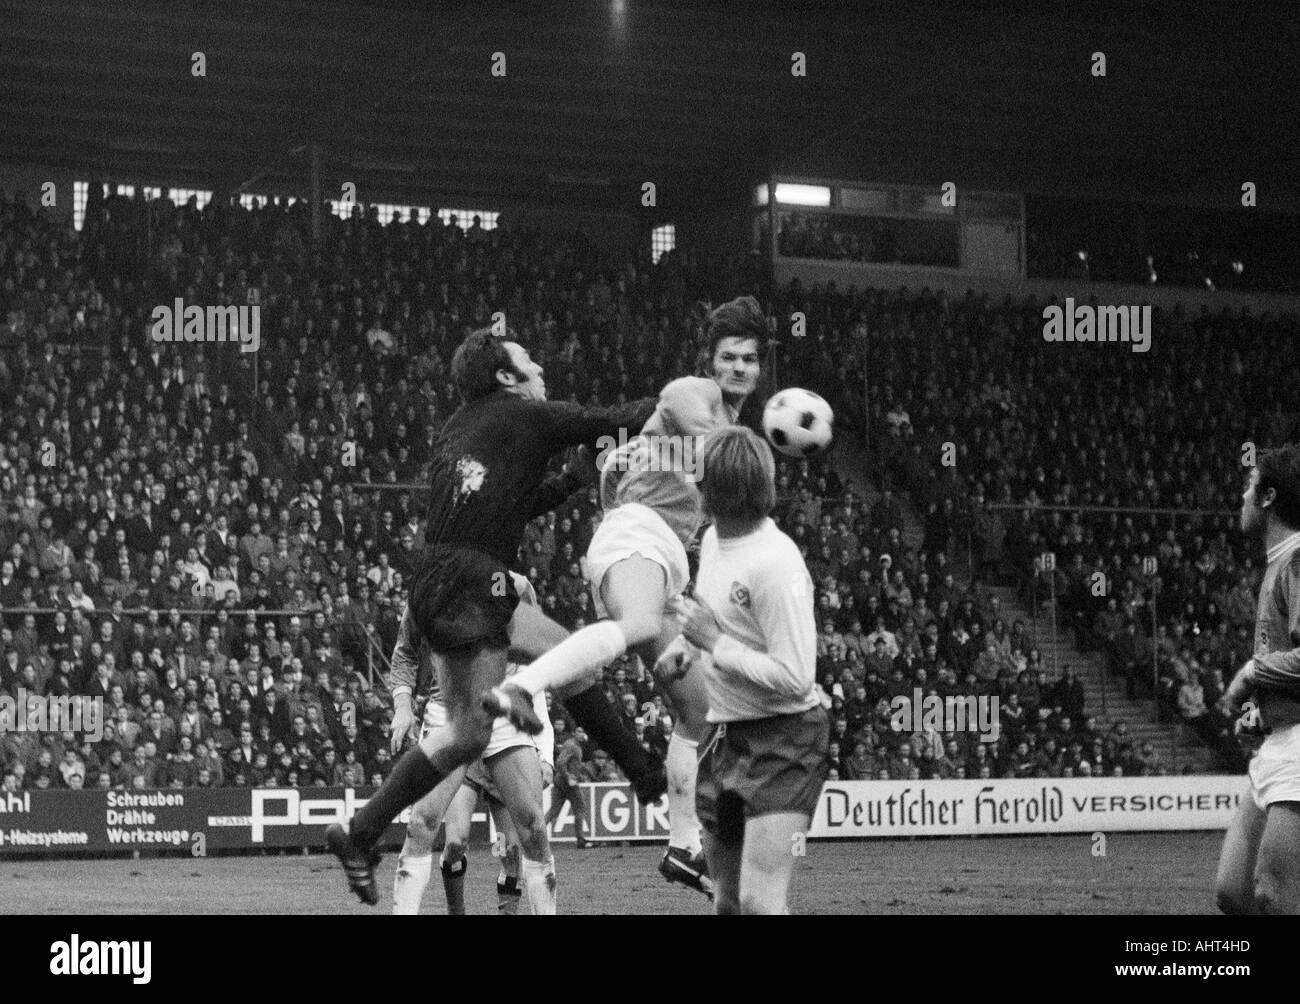 football, Bundesliga, 1970/1971, Boekelberg Stadium, Borussia Moenchengladbach versus Hamburger SV 3:0, scene of the match, f.l.t.r. keeper Arkoc Oezcan (HSV), Ulrik le Fevre (MG), Hans Schulz (HSV), Herbert Laumen (MG) - Stock Image